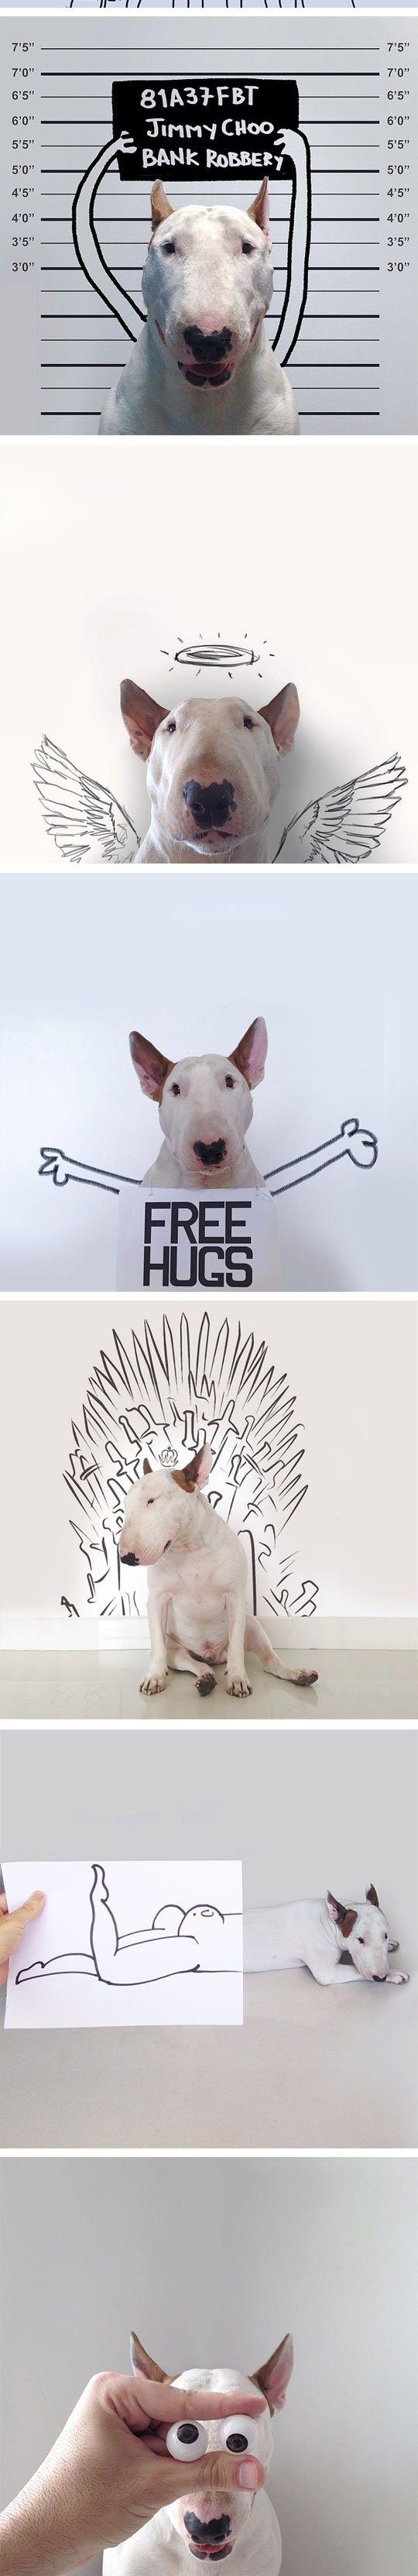 Witzige Poster mit einem #BullTerrier | #lustig #funny #hund #dog #hunde #dogs #terrier